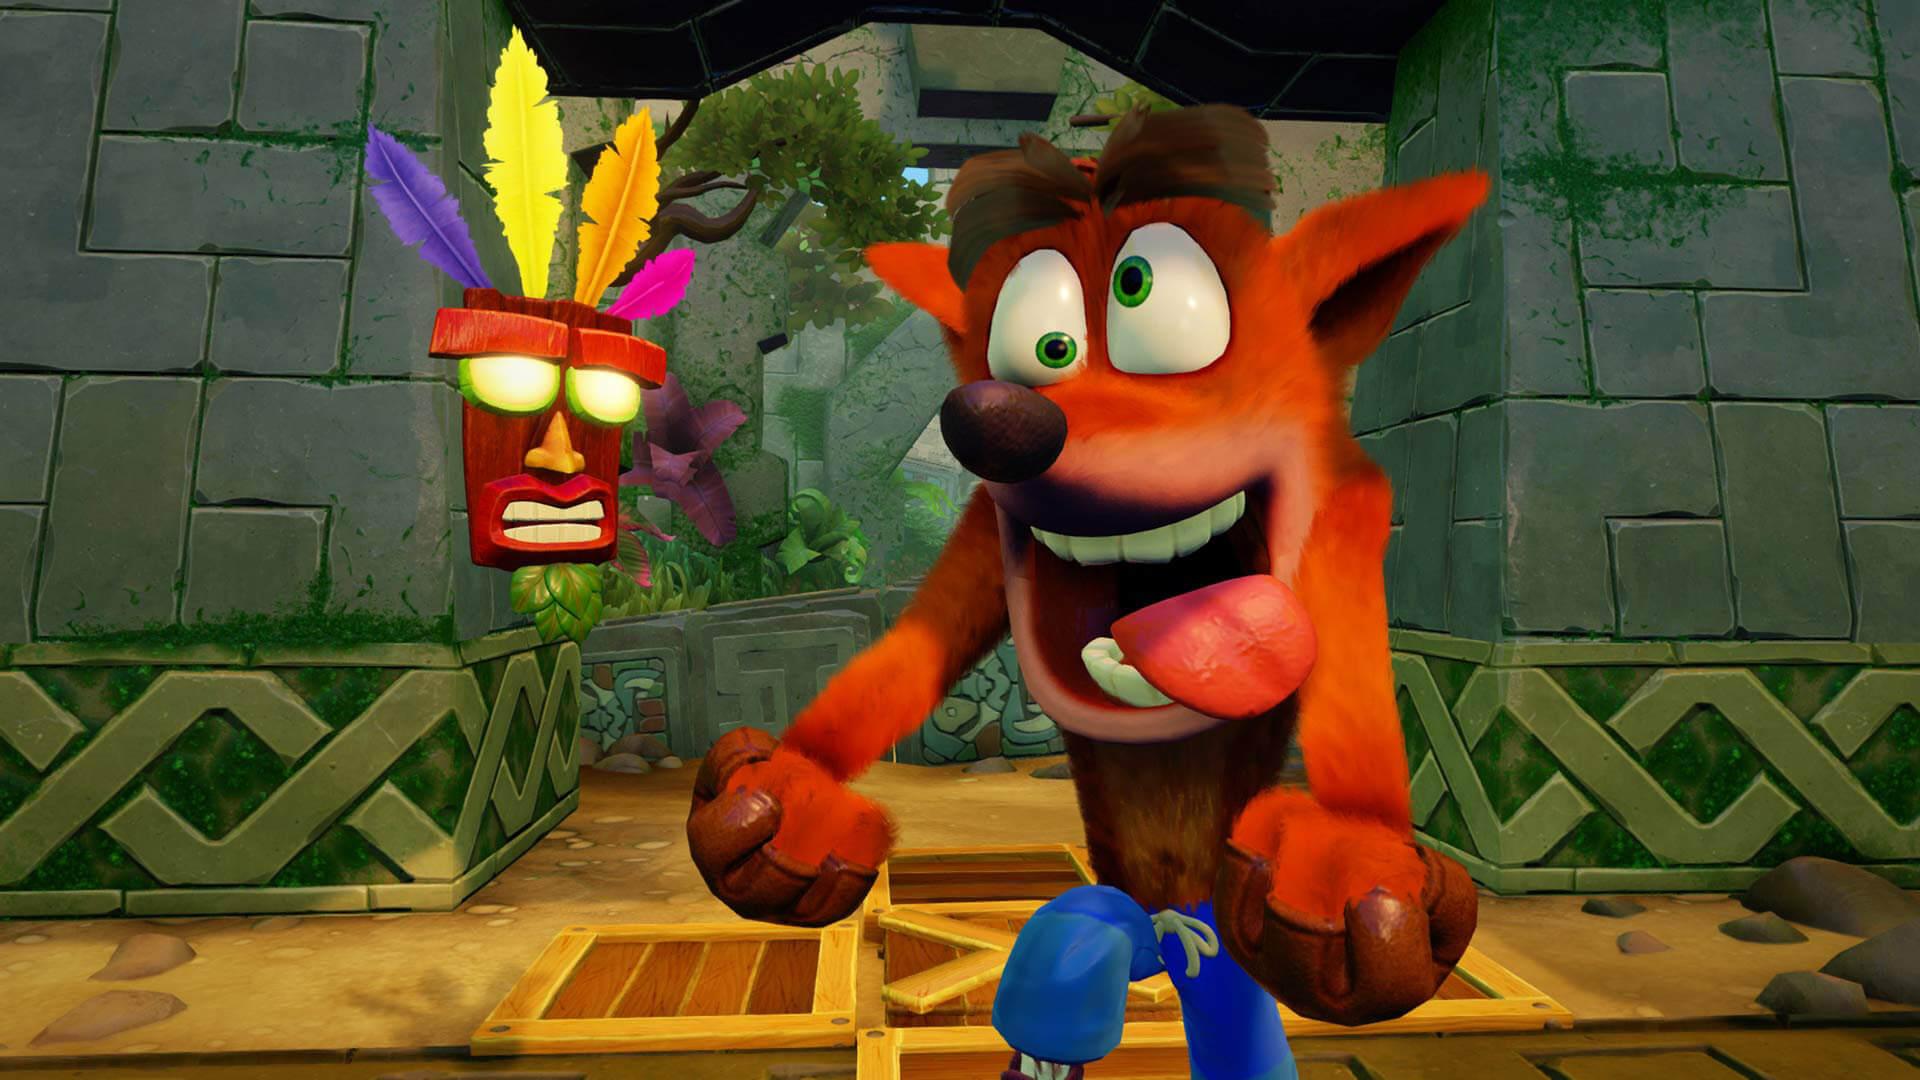 Crash Bandicoot is back.